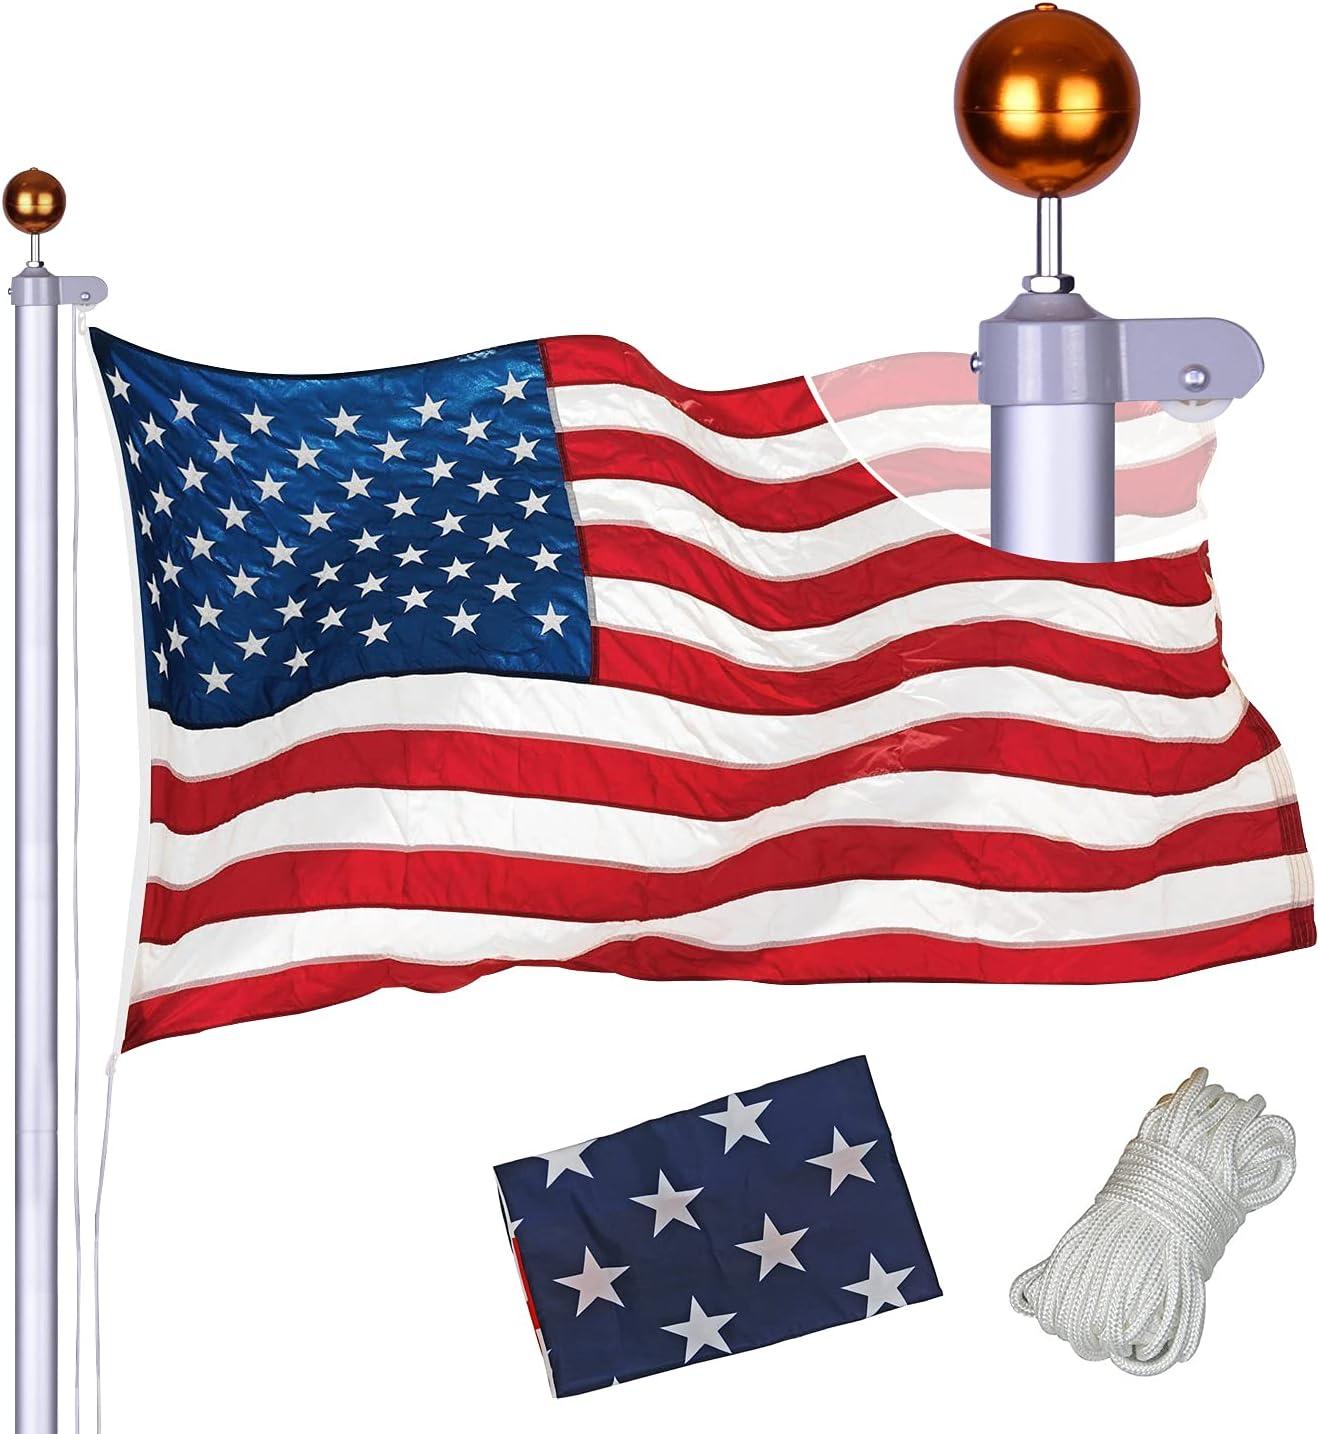 Sectional Flag Pole Kit 好評受付中 高額売筋 Extra Duty Heavy Thick Aluminum Flagpol